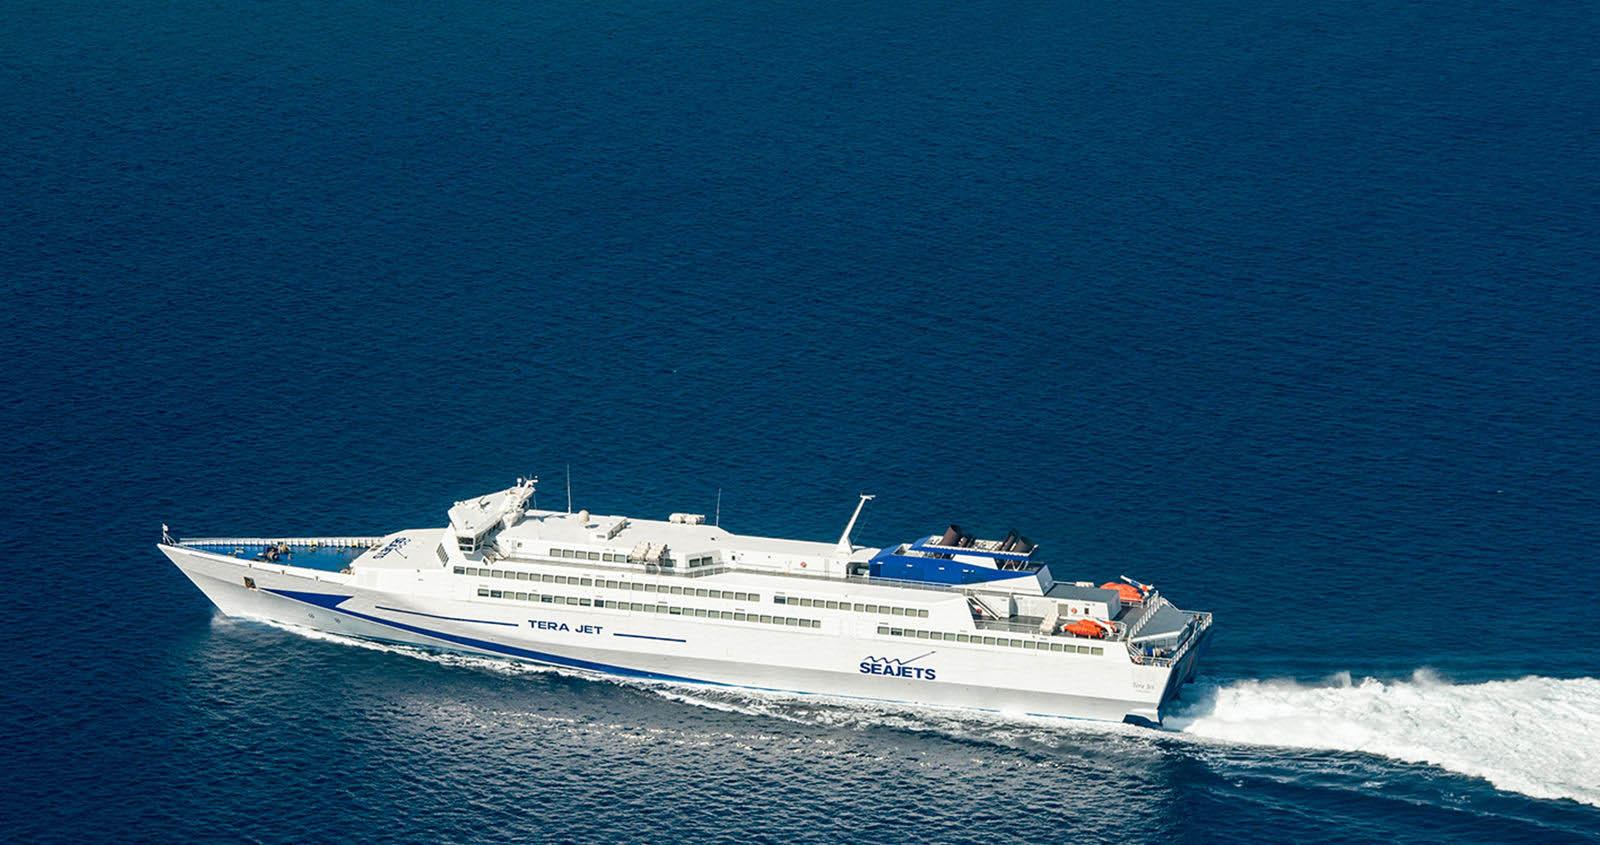 Seajets Ferry